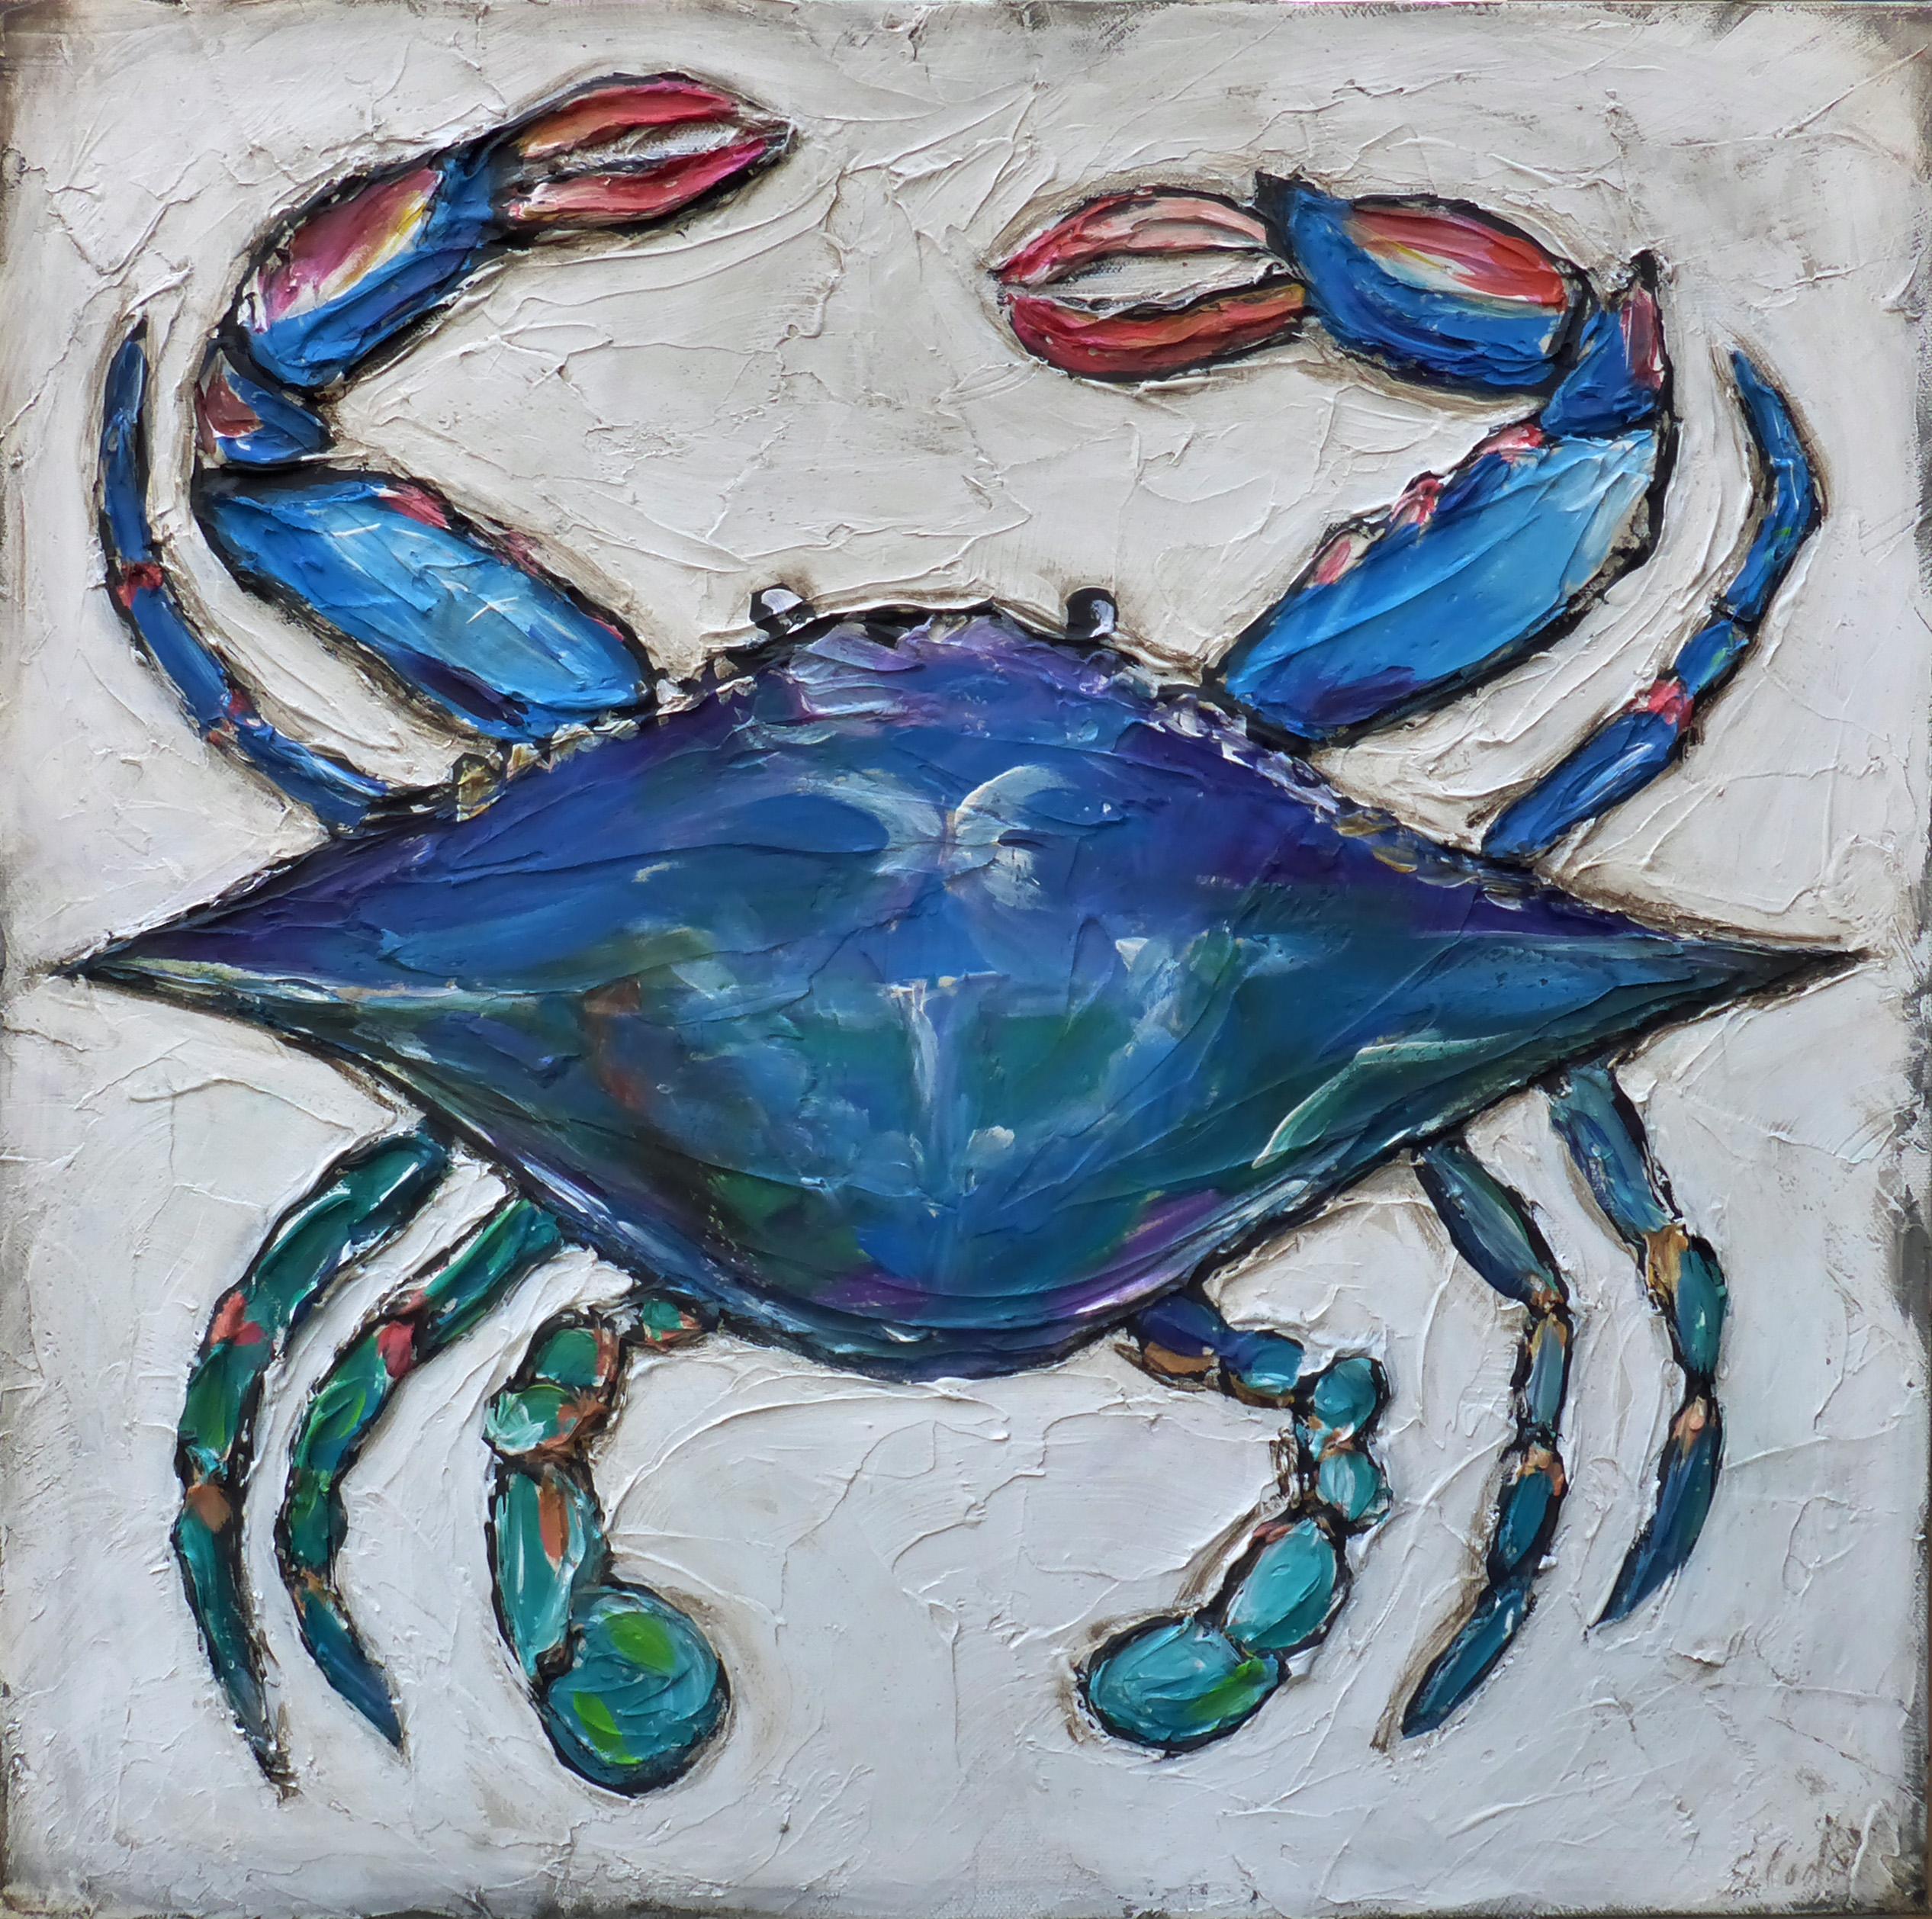 Blue Crab 2 20x20